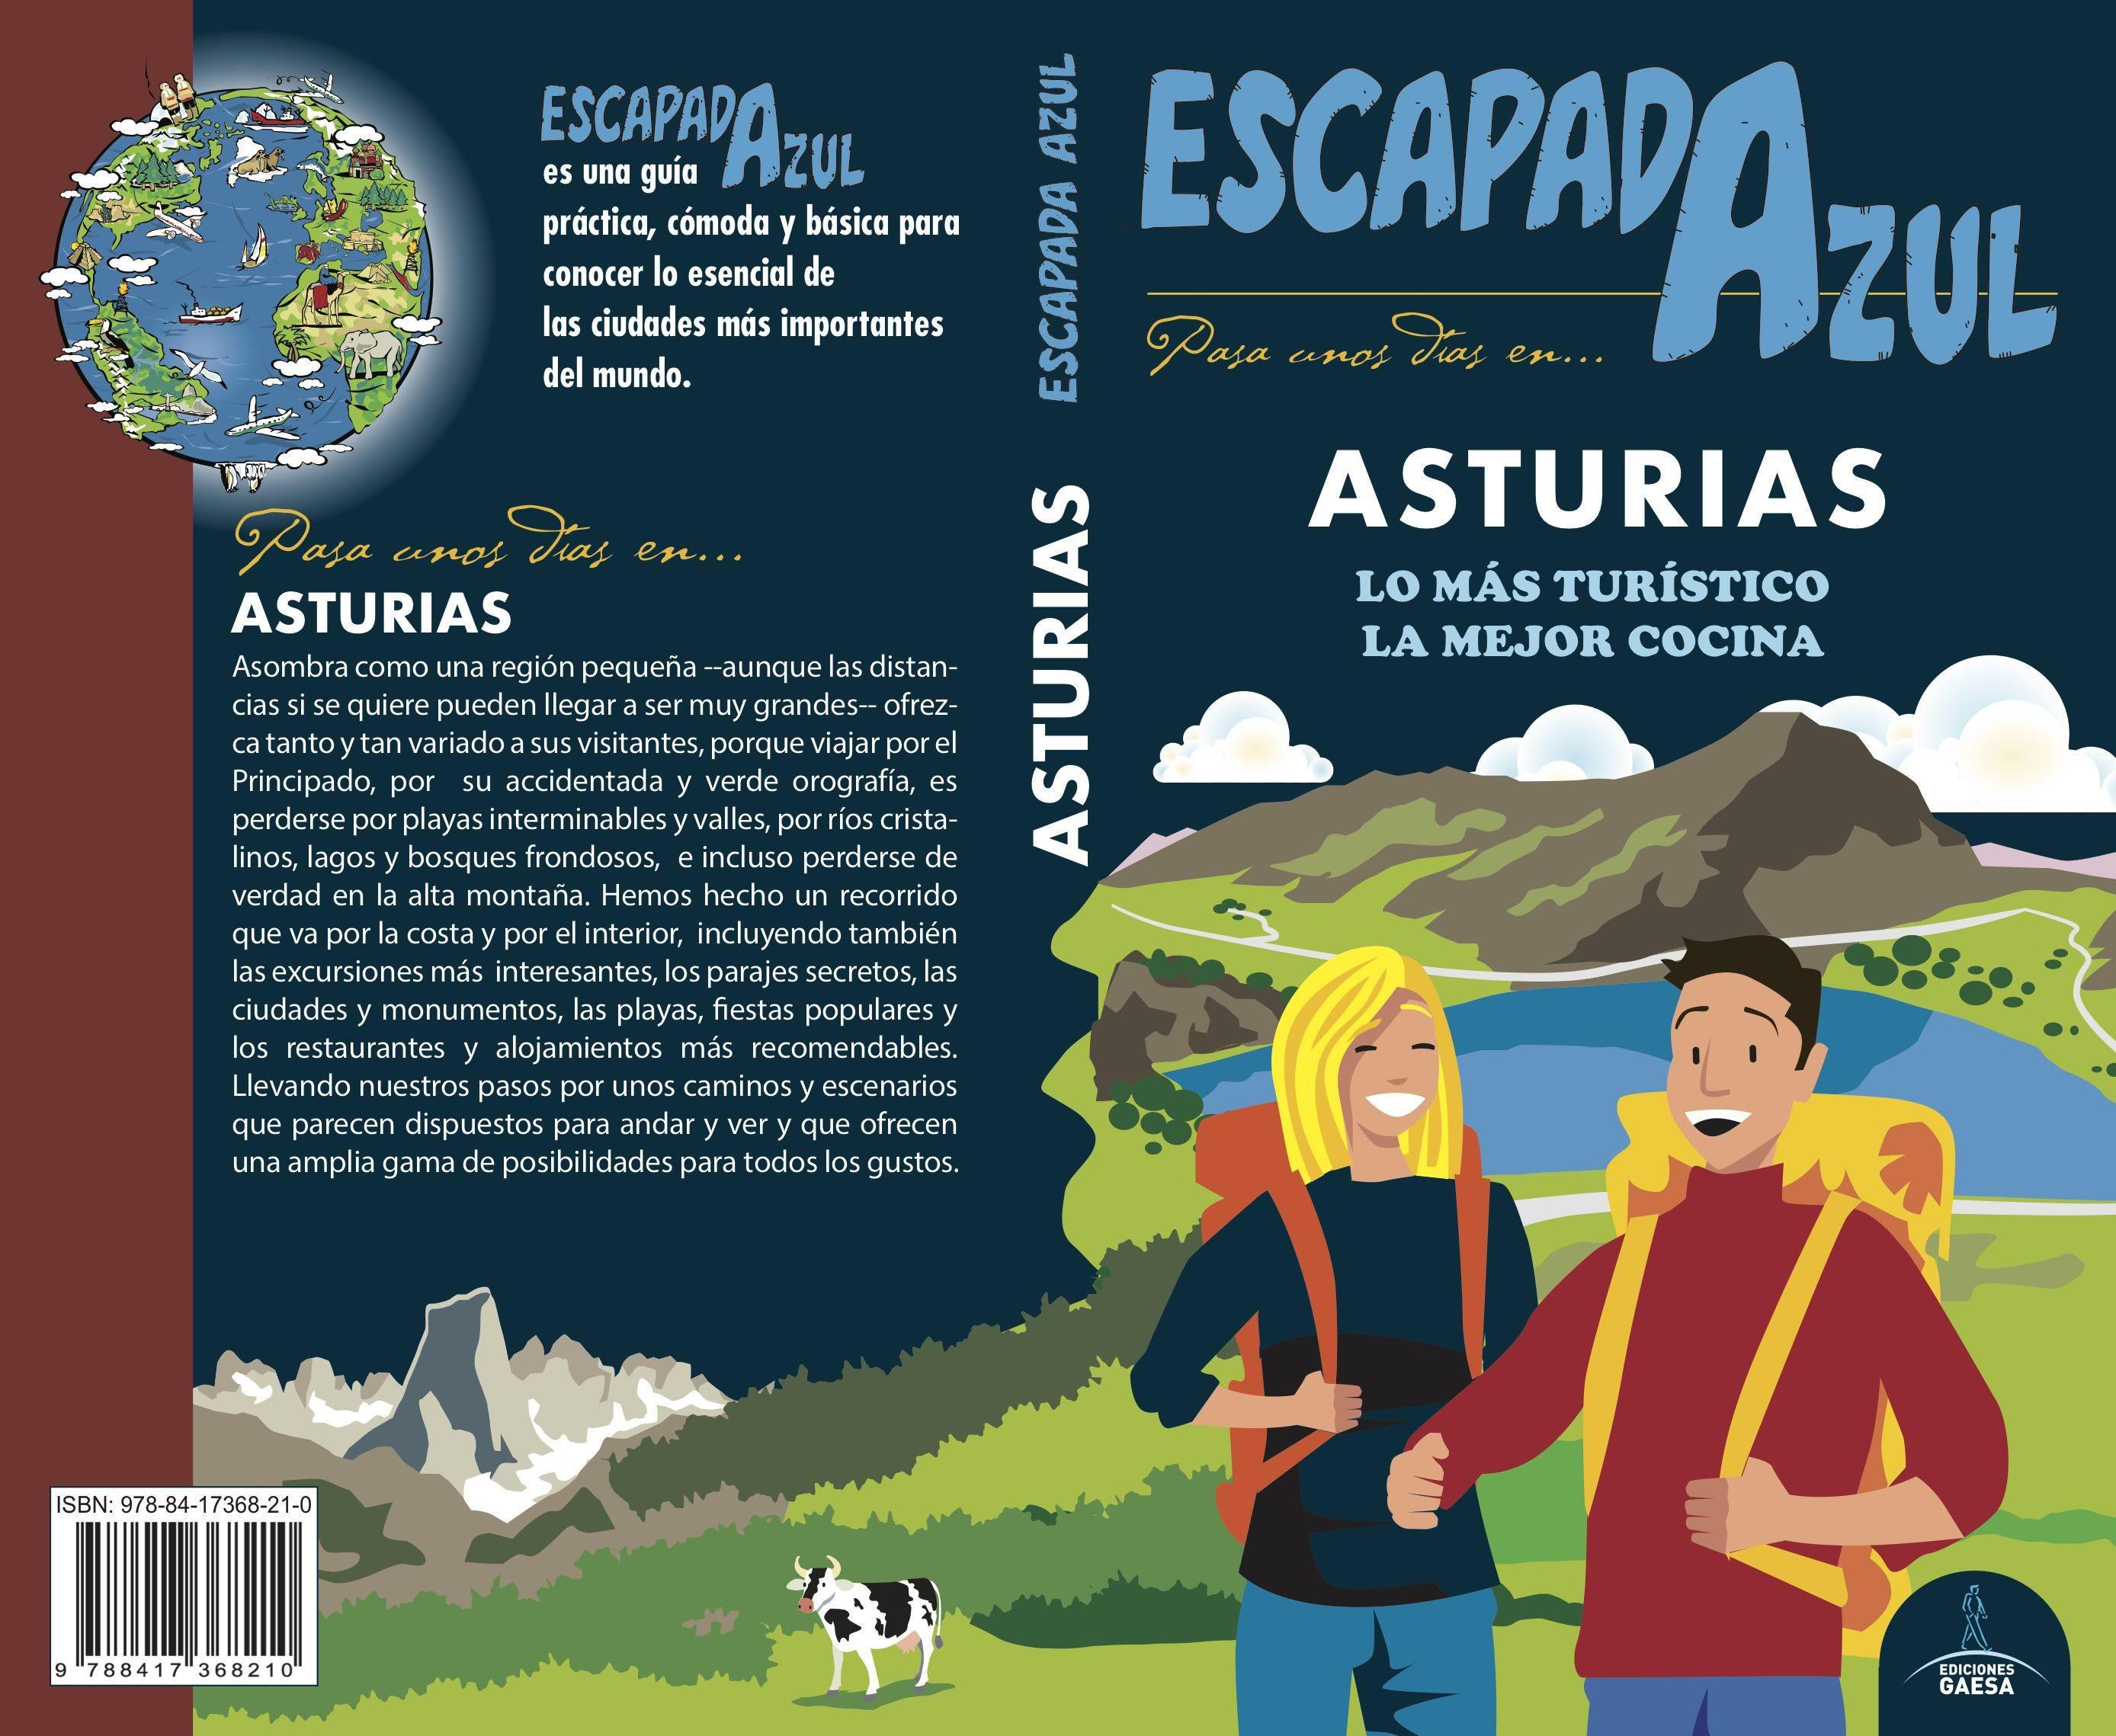 asturias 2018 (escapada azul) 3ª ed.-jesus garcia marin-9788417368210